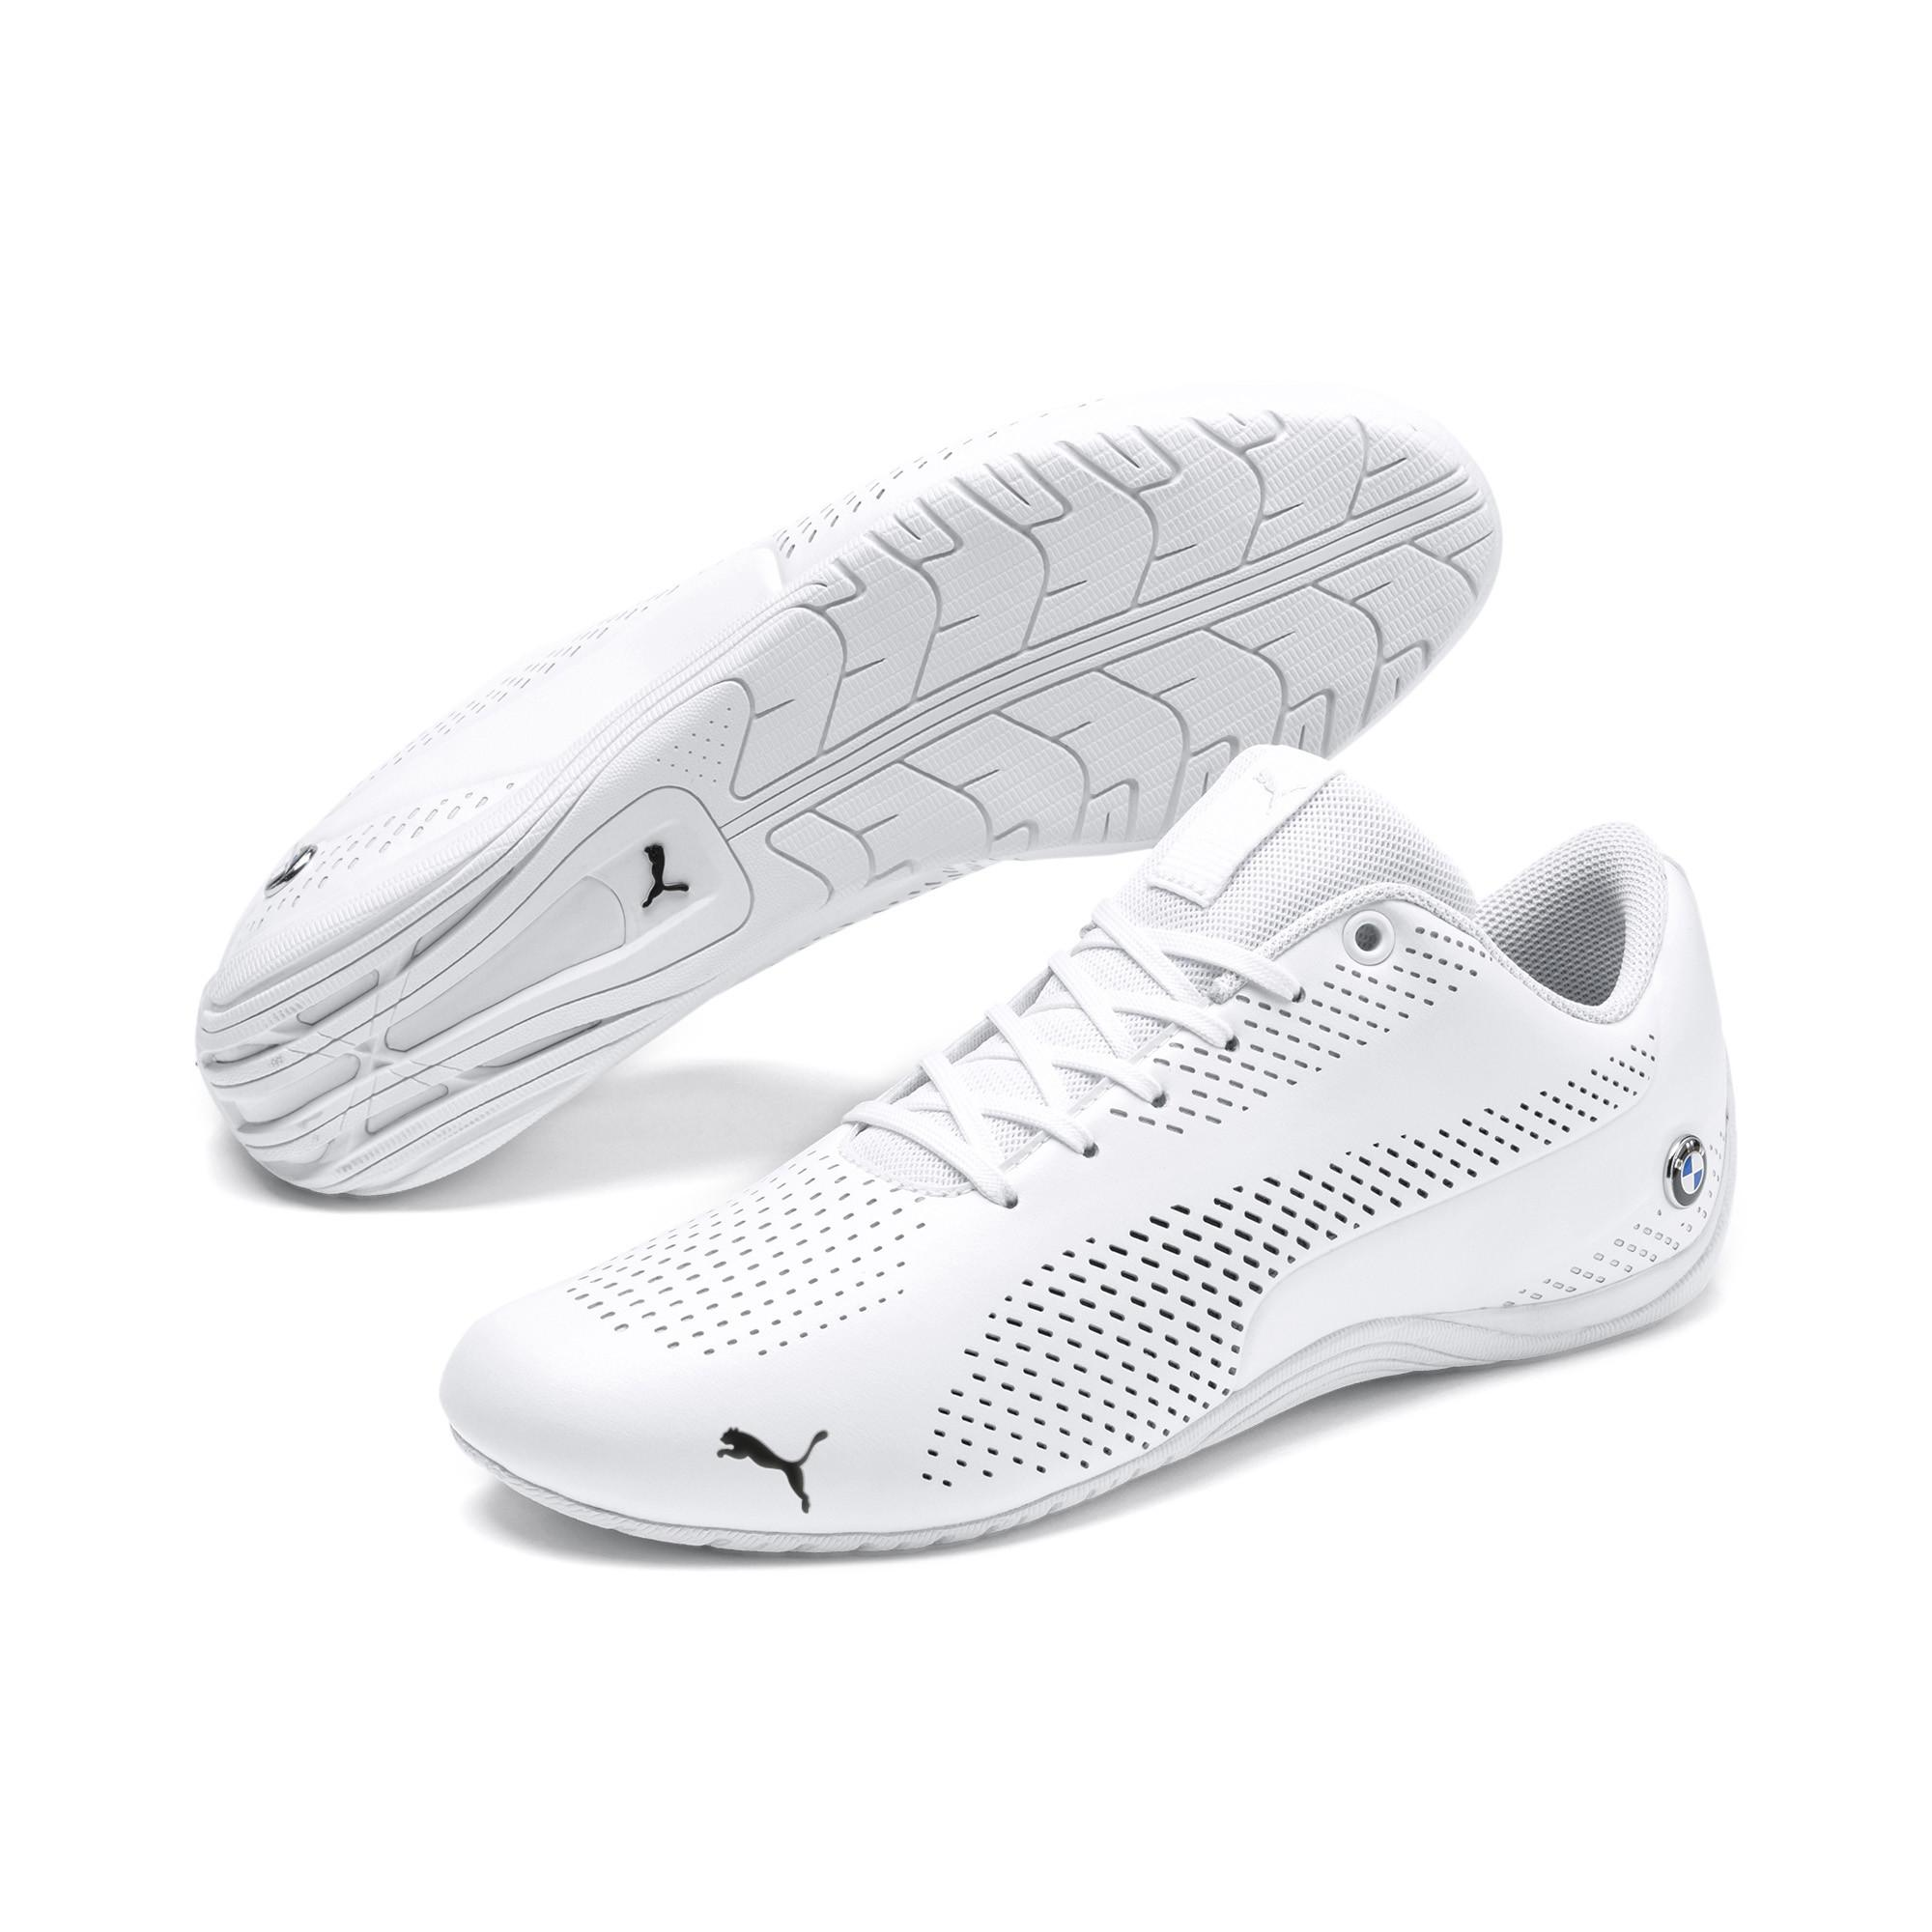 a2f15a9236a PUMA - White Bmw Mms Drift Cat 5 Ultra Ii Men s Sneakers for Men - Lyst.  View fullscreen